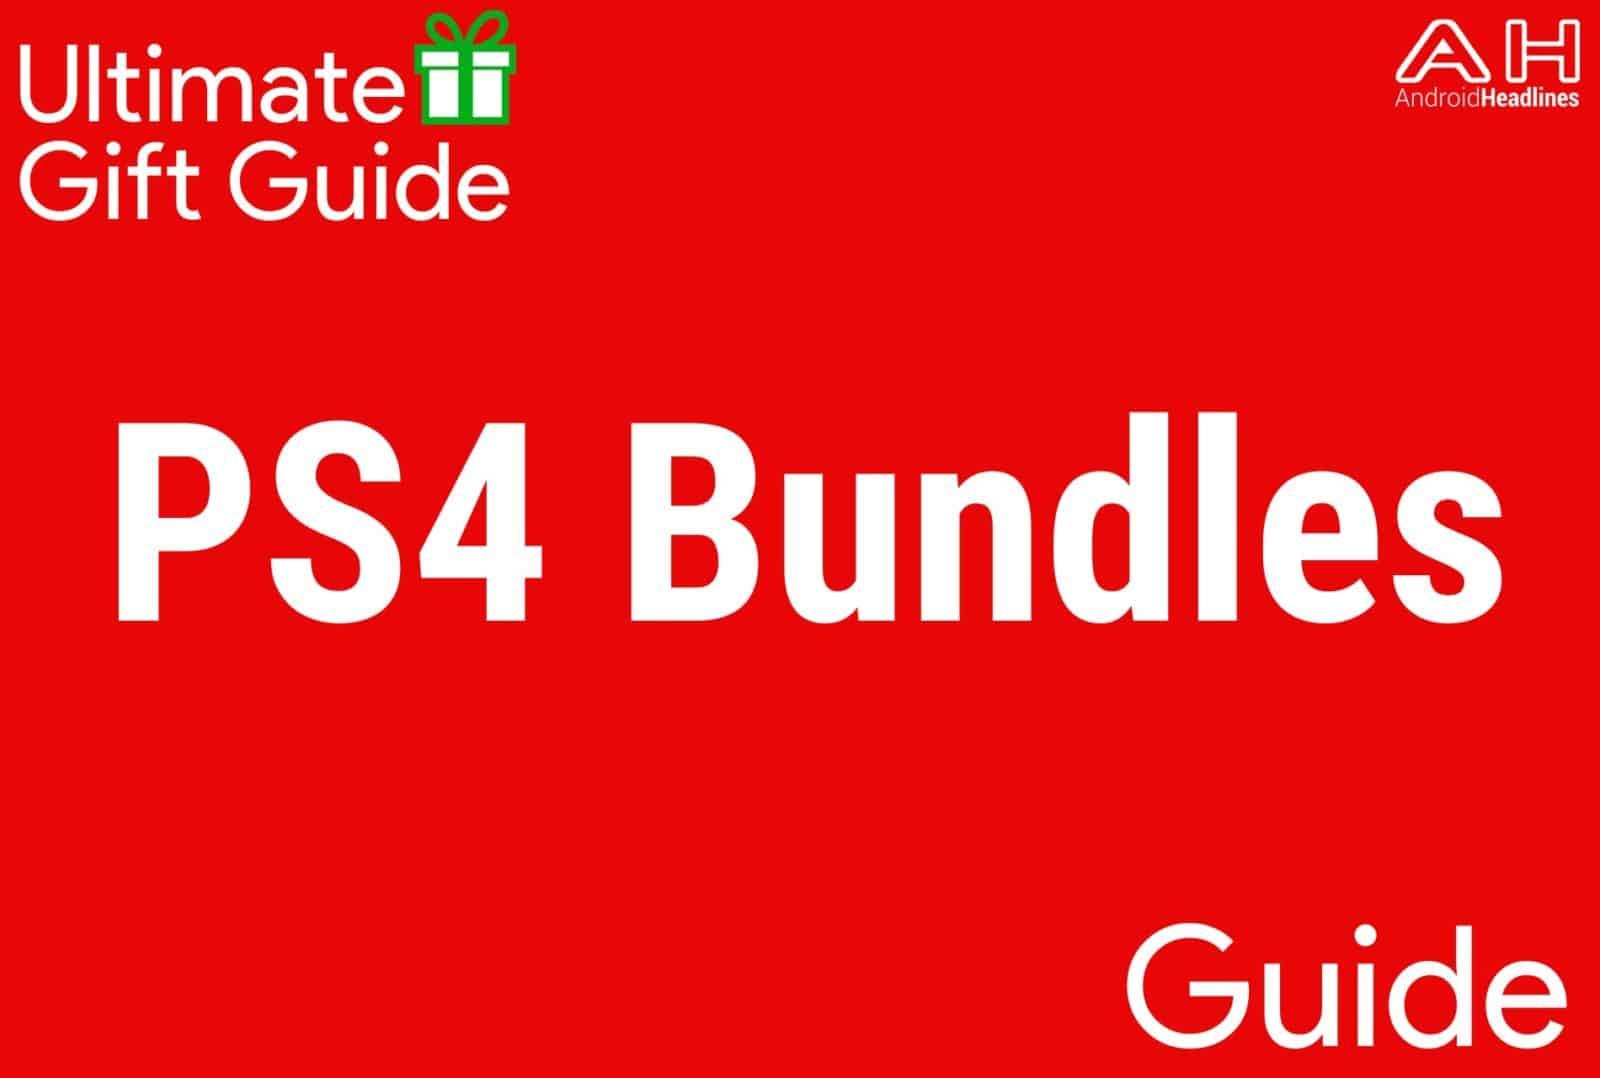 PS4 Bundles - Gift Guide 2015